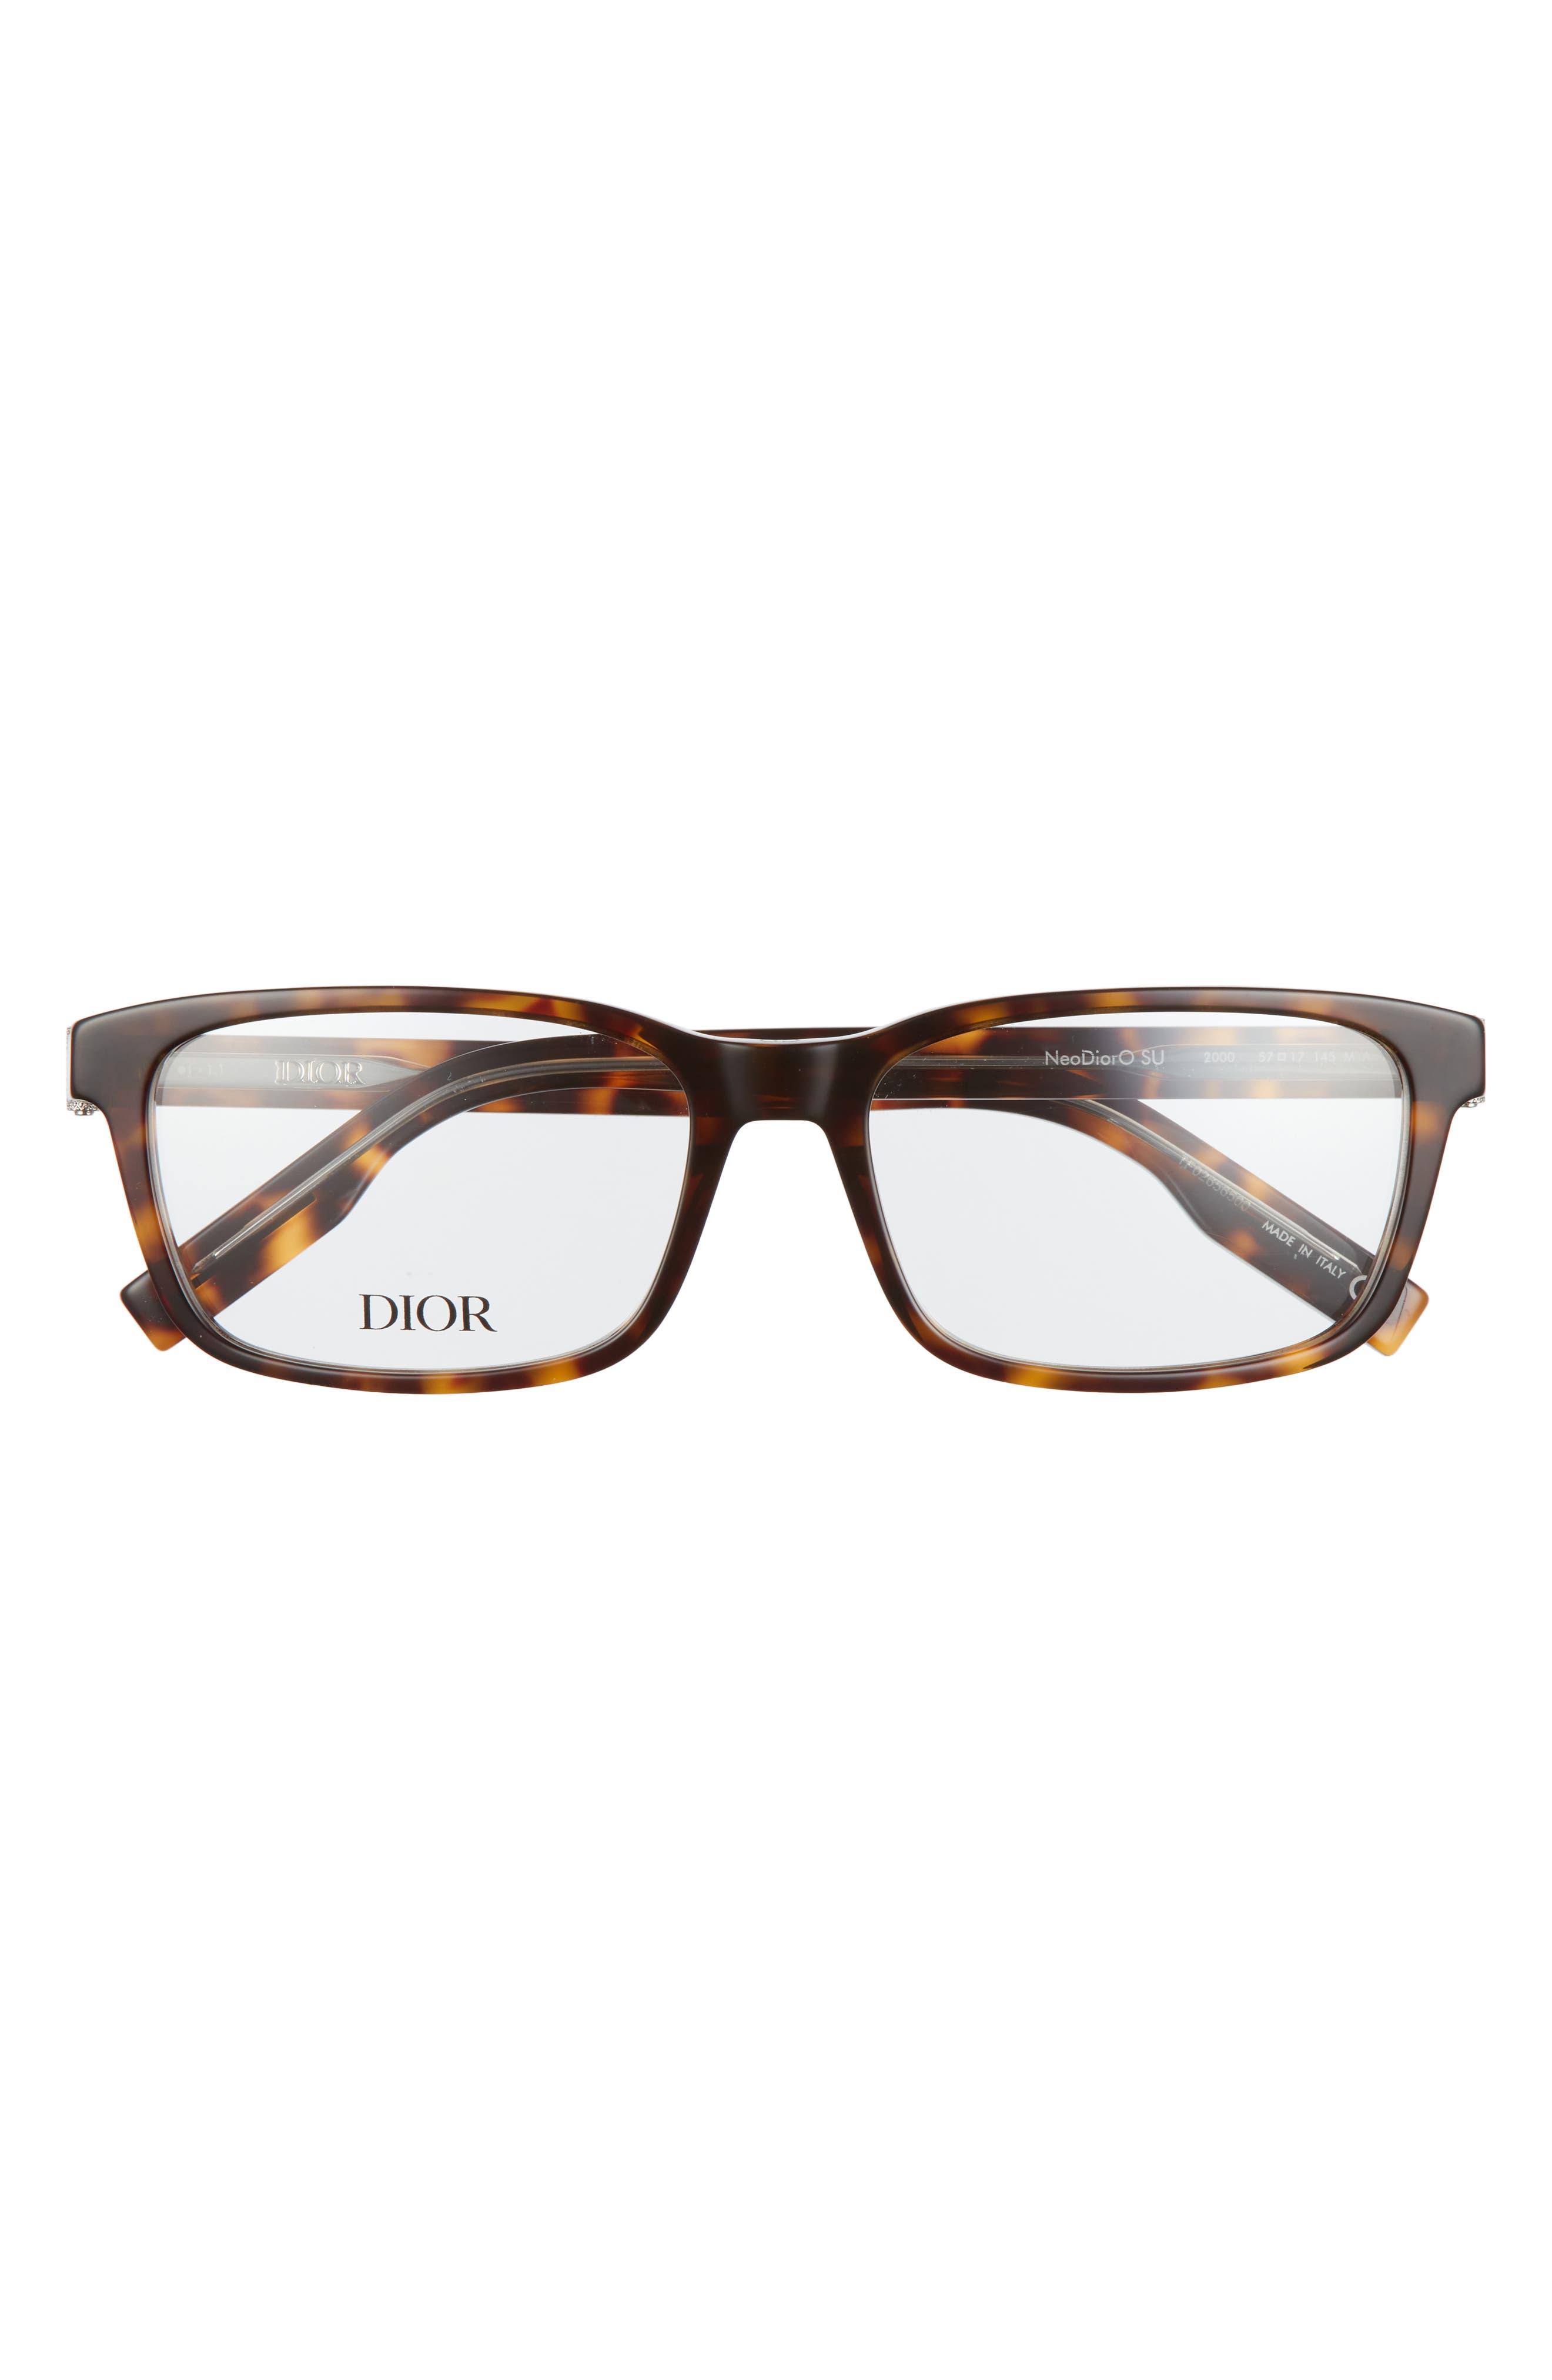 Men's Dior 57mm Rectangular Optical Glasses